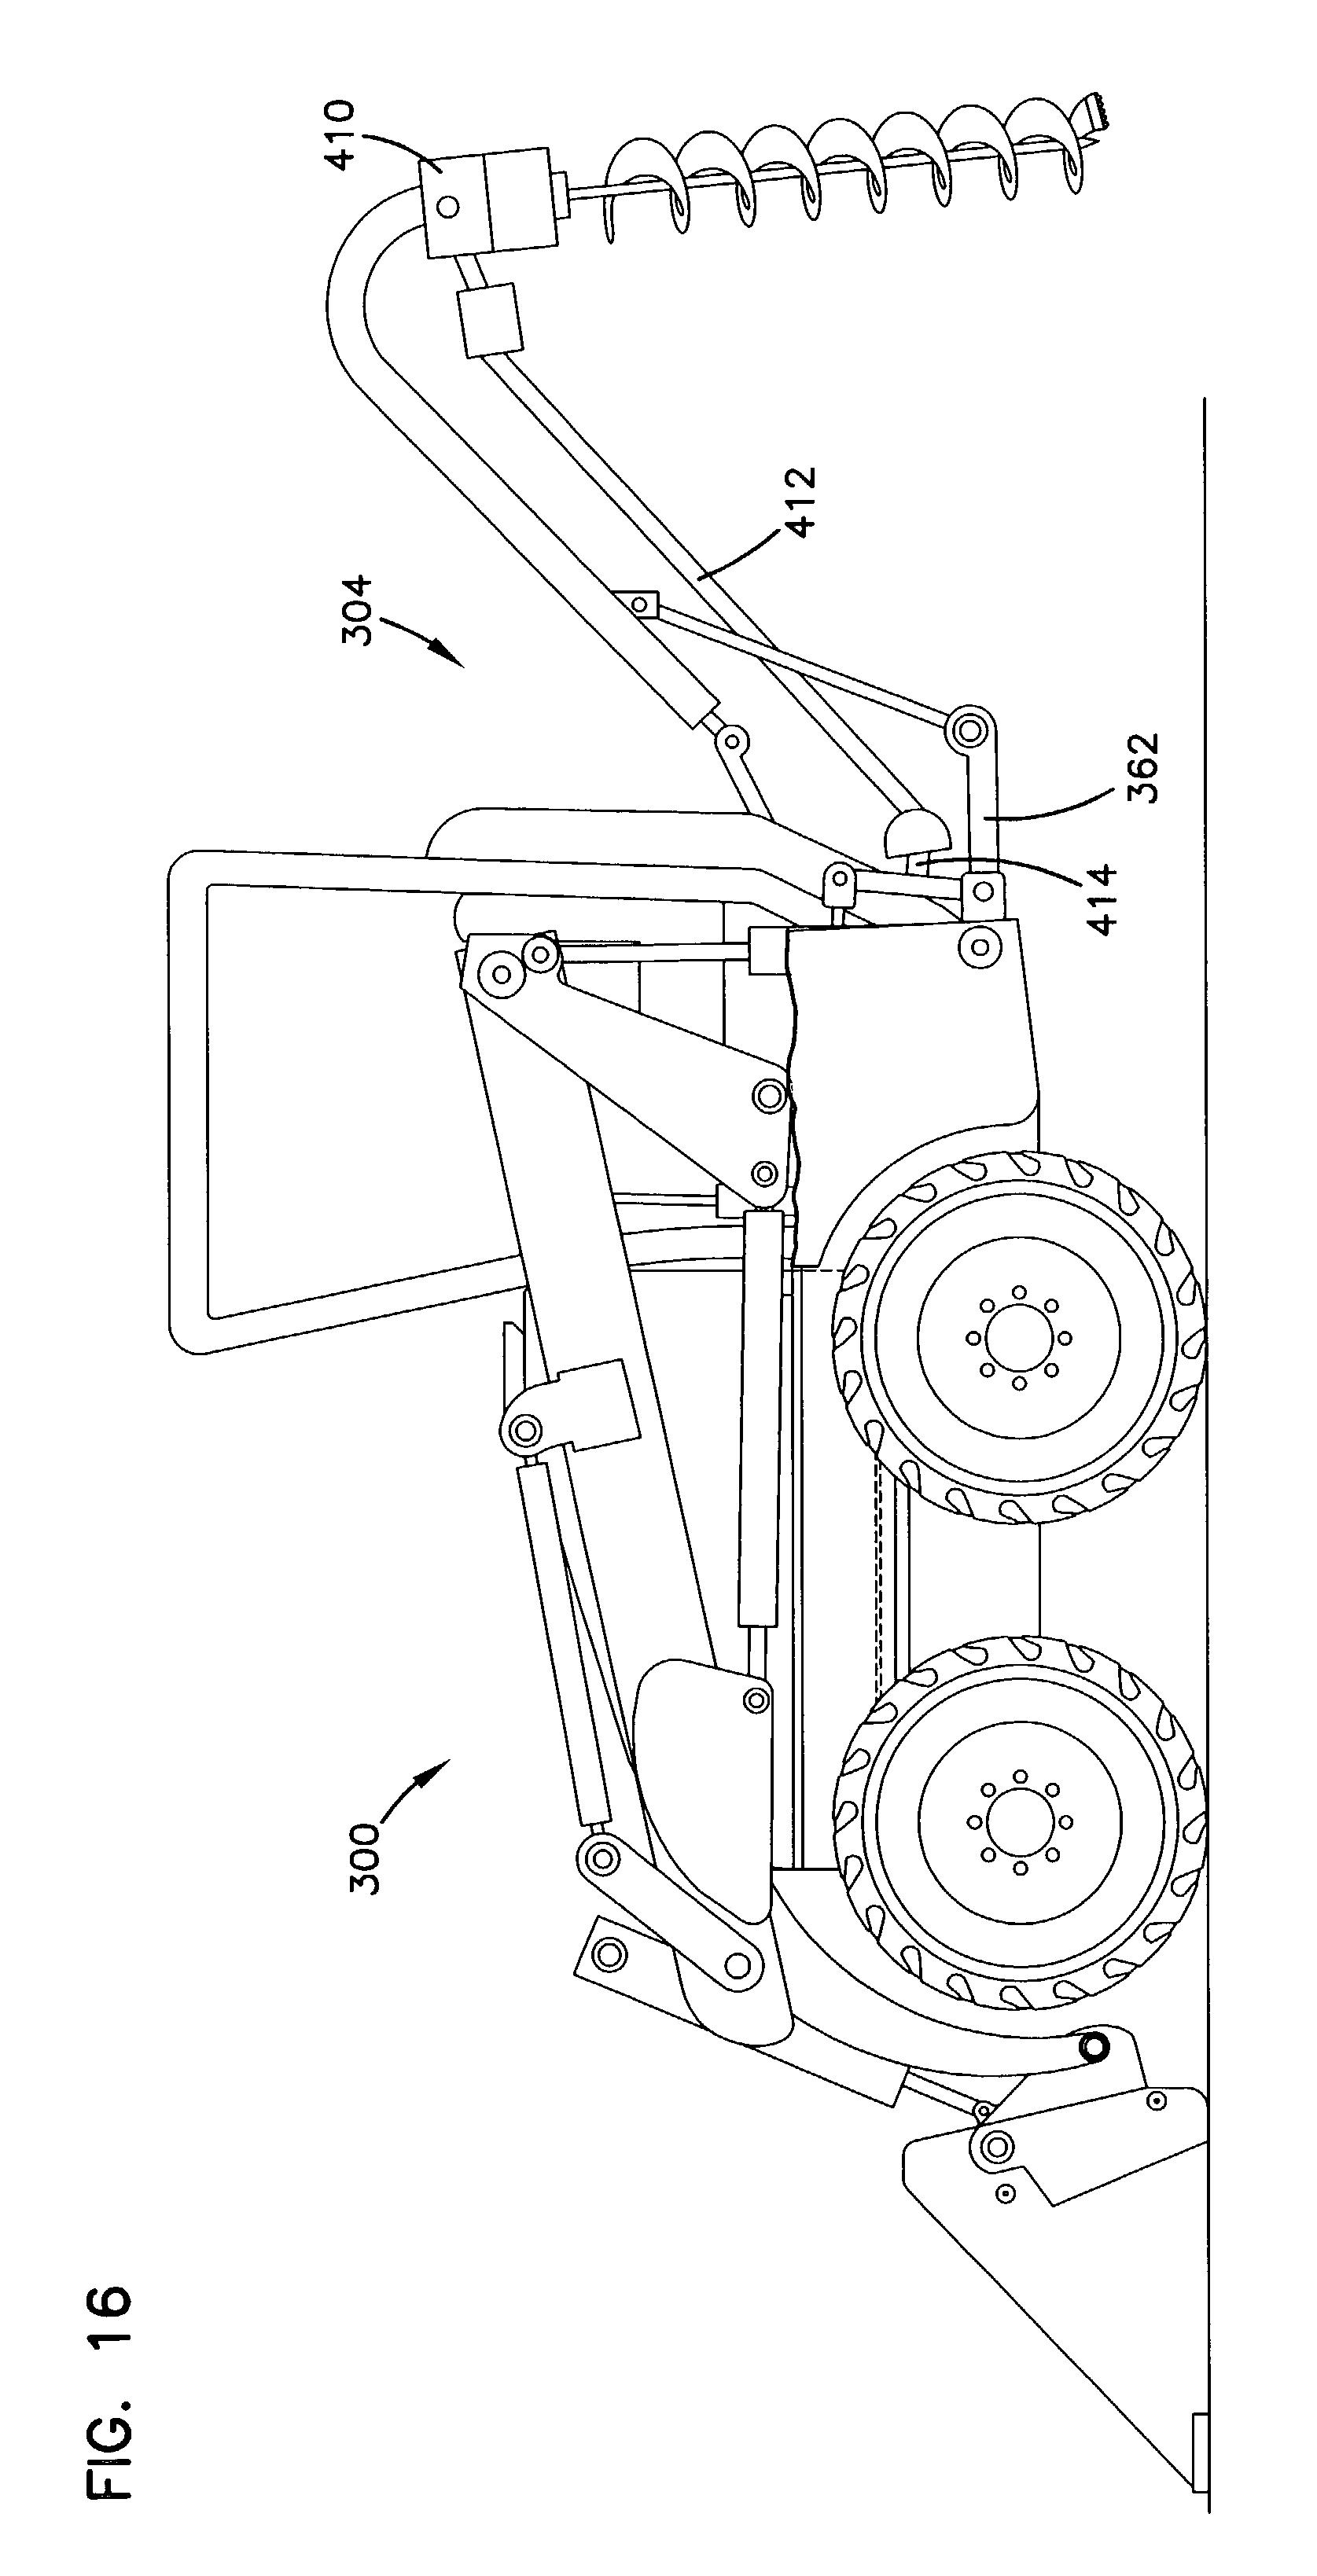 John Deere X495 Wiring Diagram : John deere wiring diagram